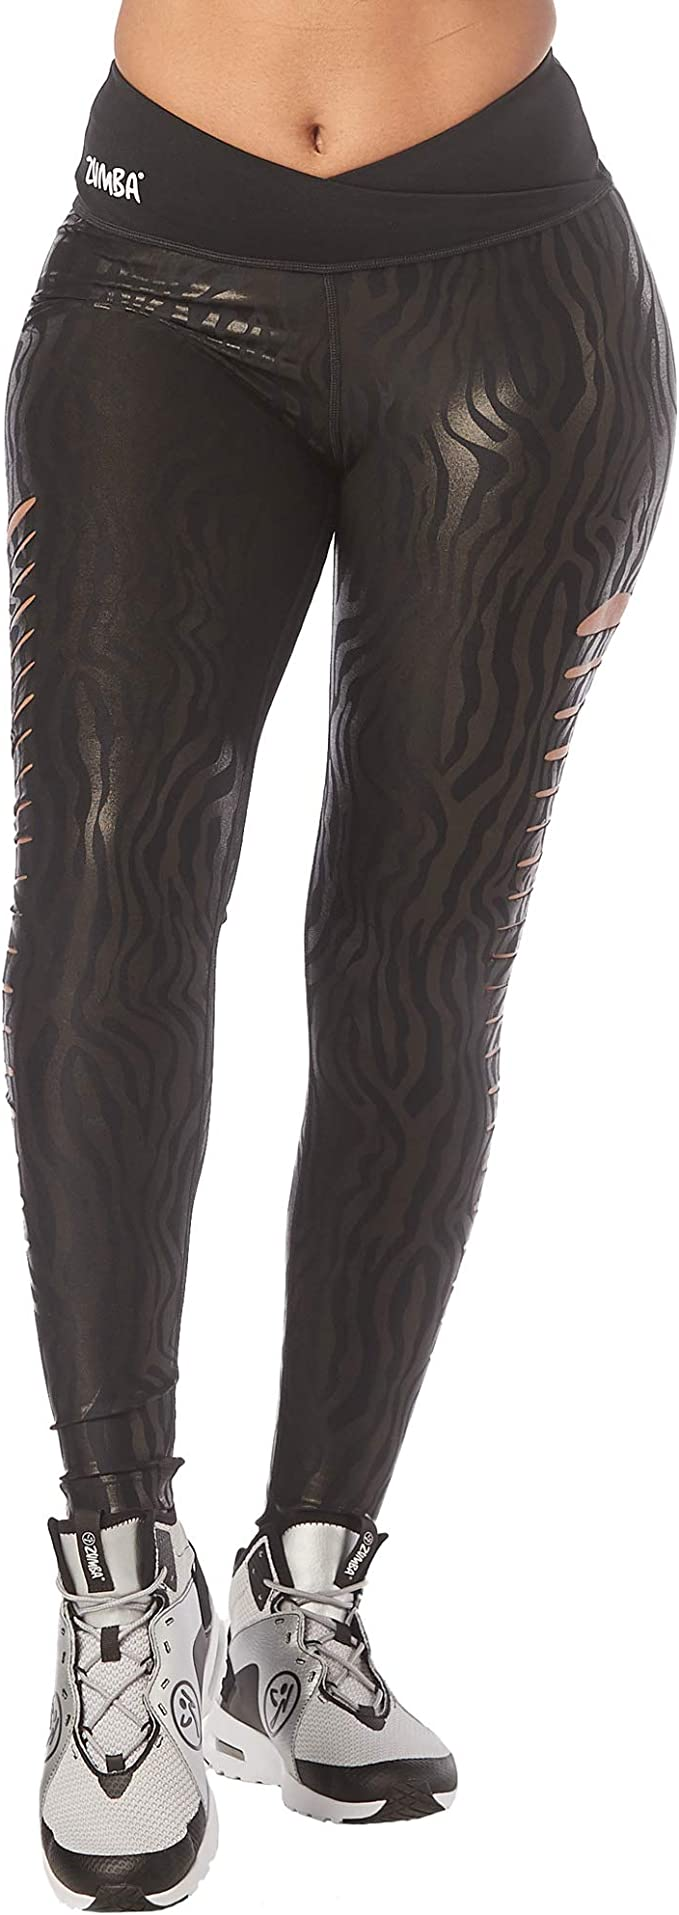 Medium Zumba Celebrate Love Metallic Ankle Leggings Black ~ Small Large